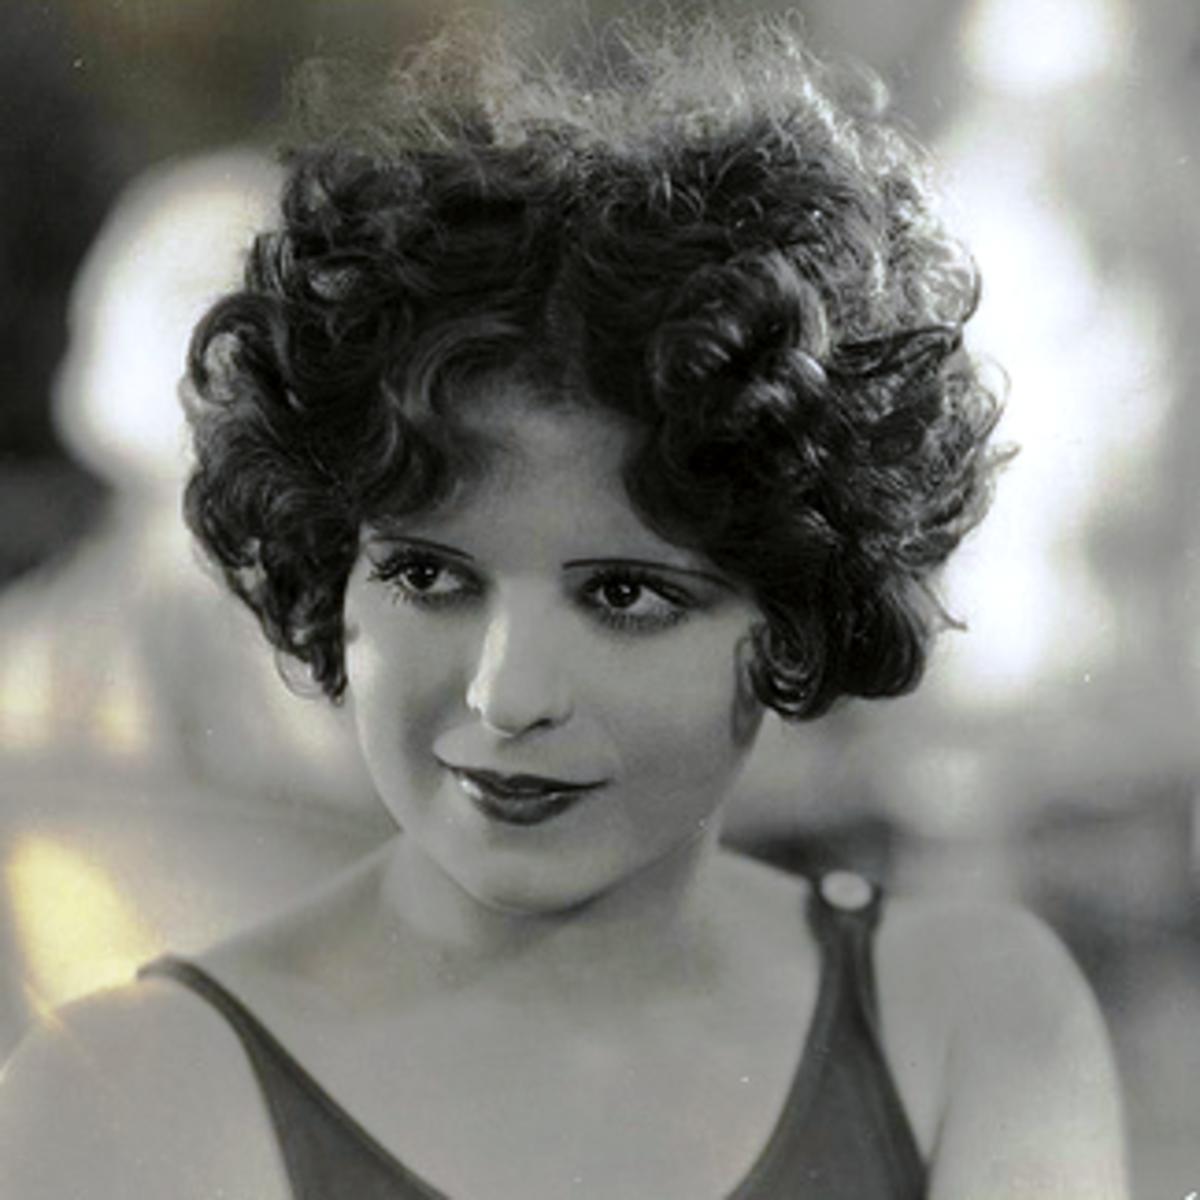 Clara Bow with a short, curly bob.